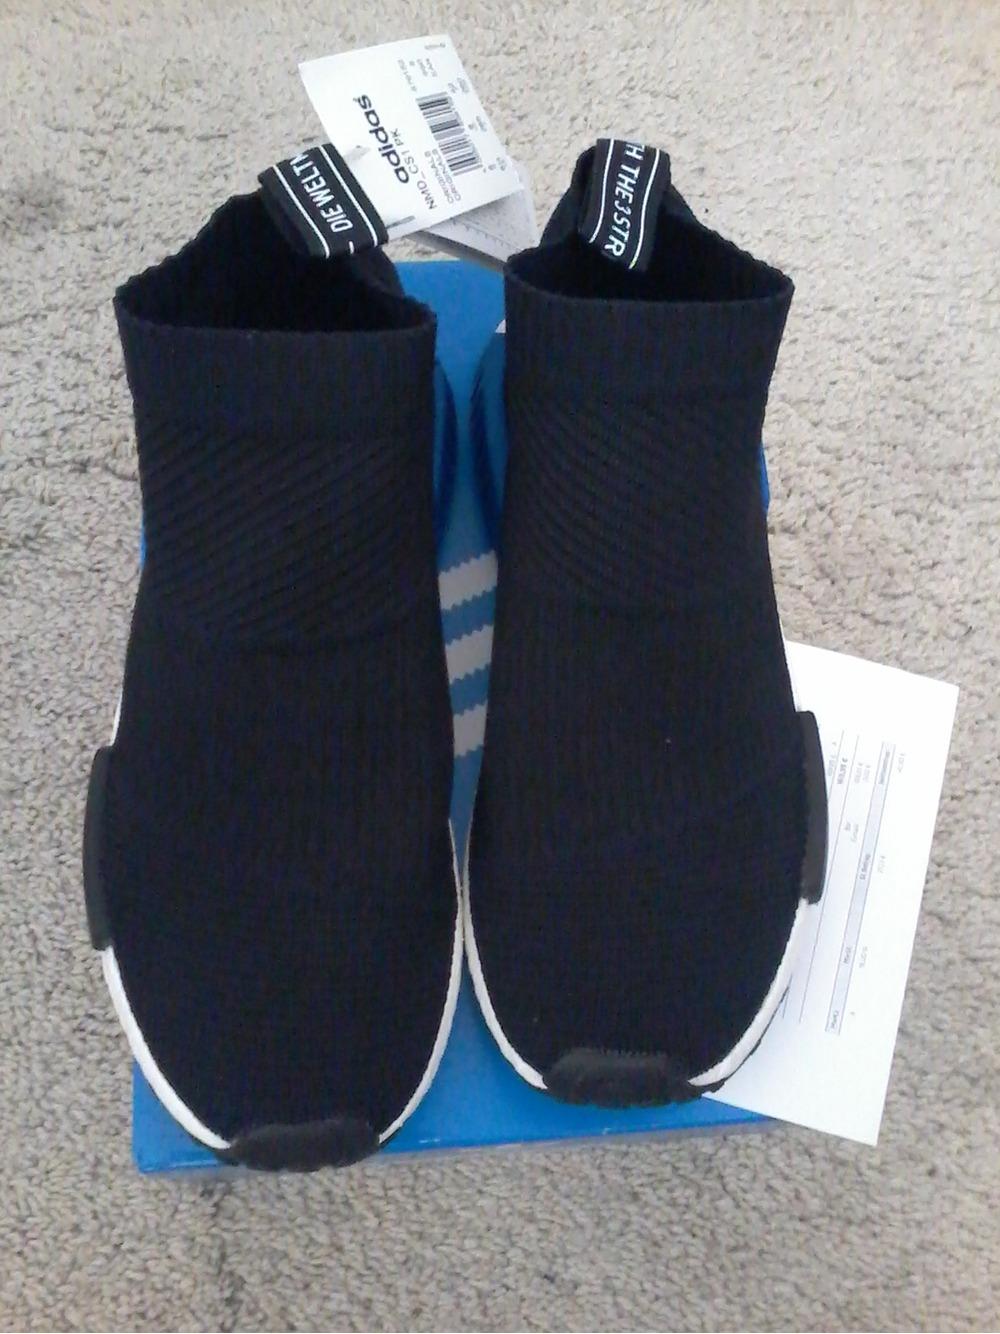 separation shoes 2522f fe490 Adidas NMD CS1 PK Winter Wool S32184 City Sock Black US 13